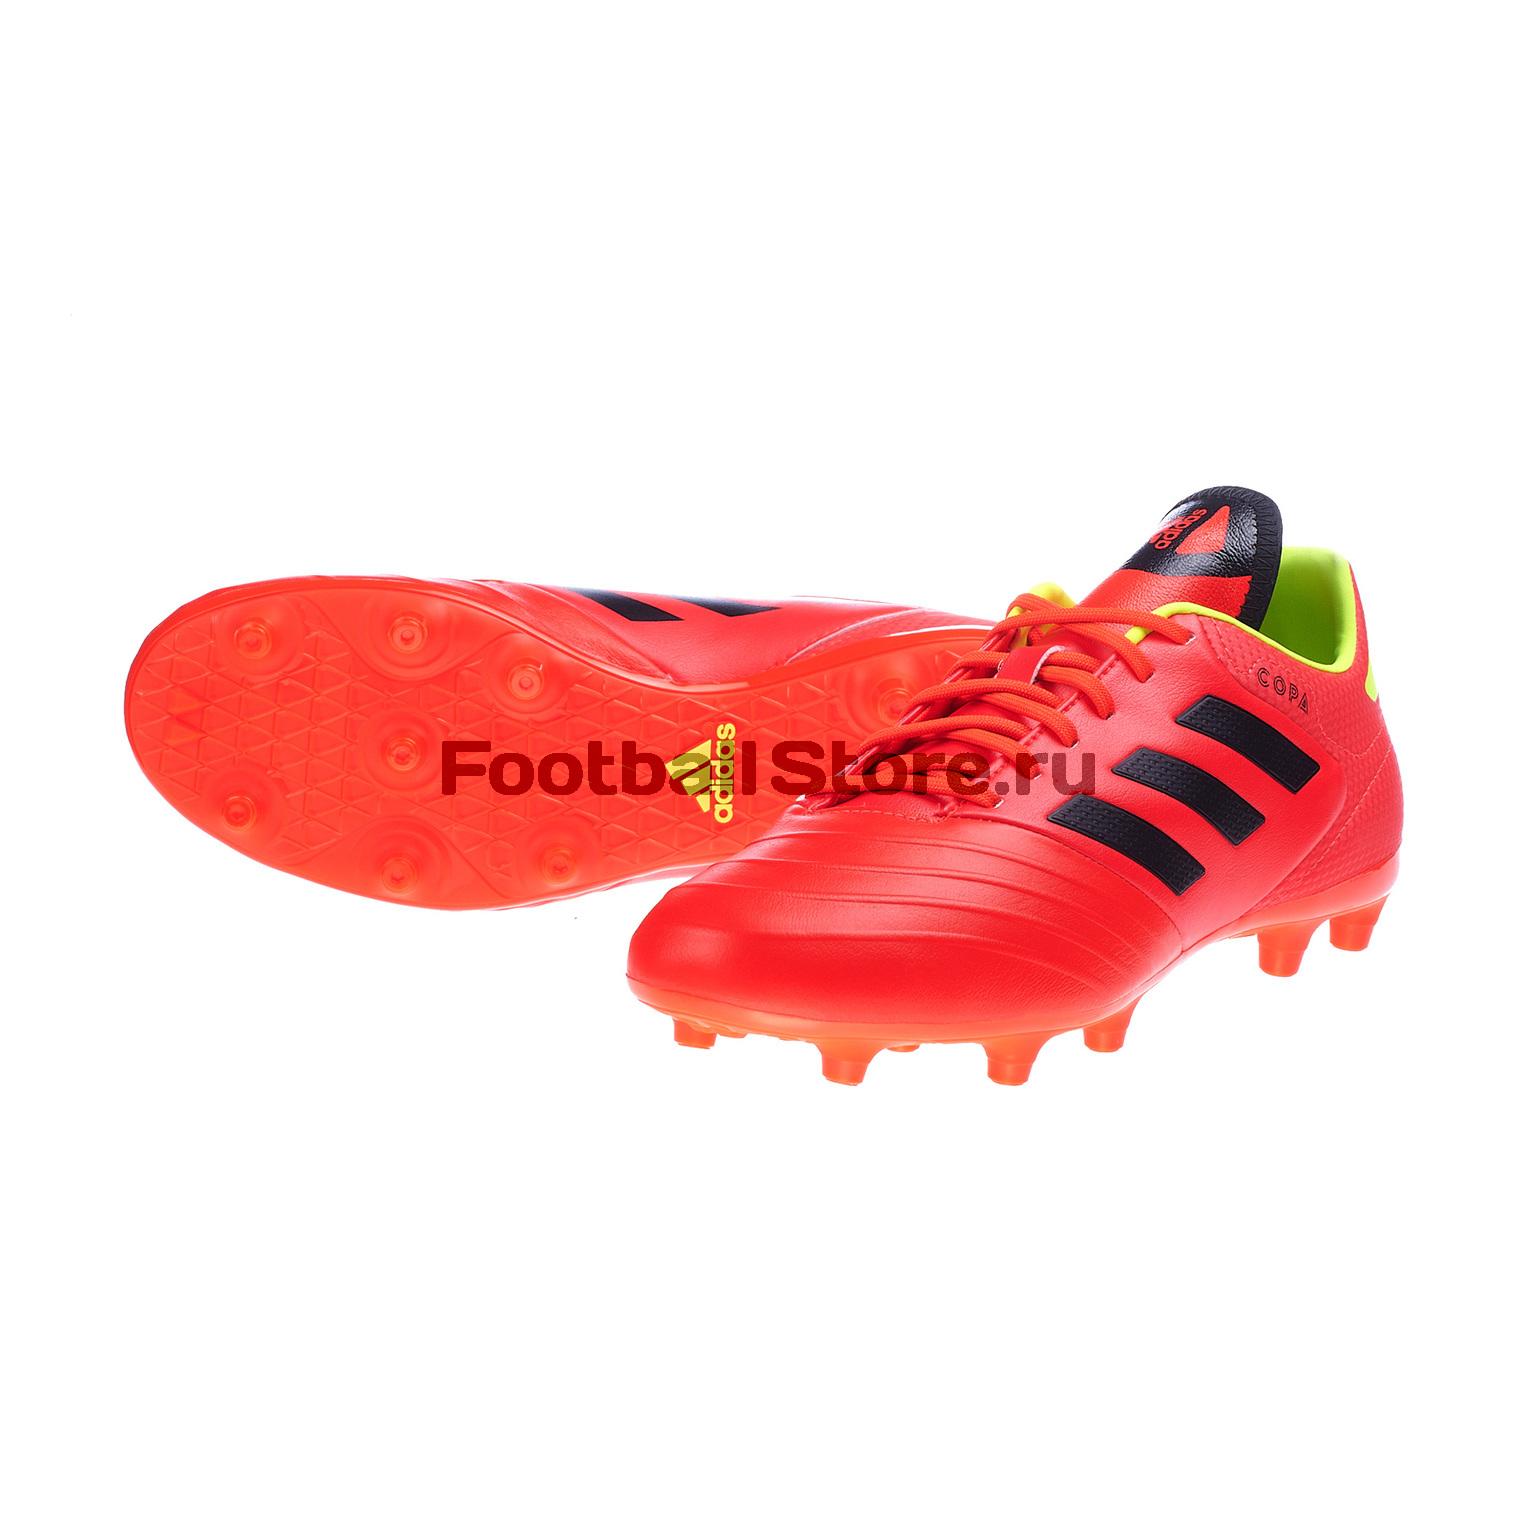 Бутсы Adidas Copa 18.3 FG DB2461 бутсы adidas messi 16 2 fg aq3111